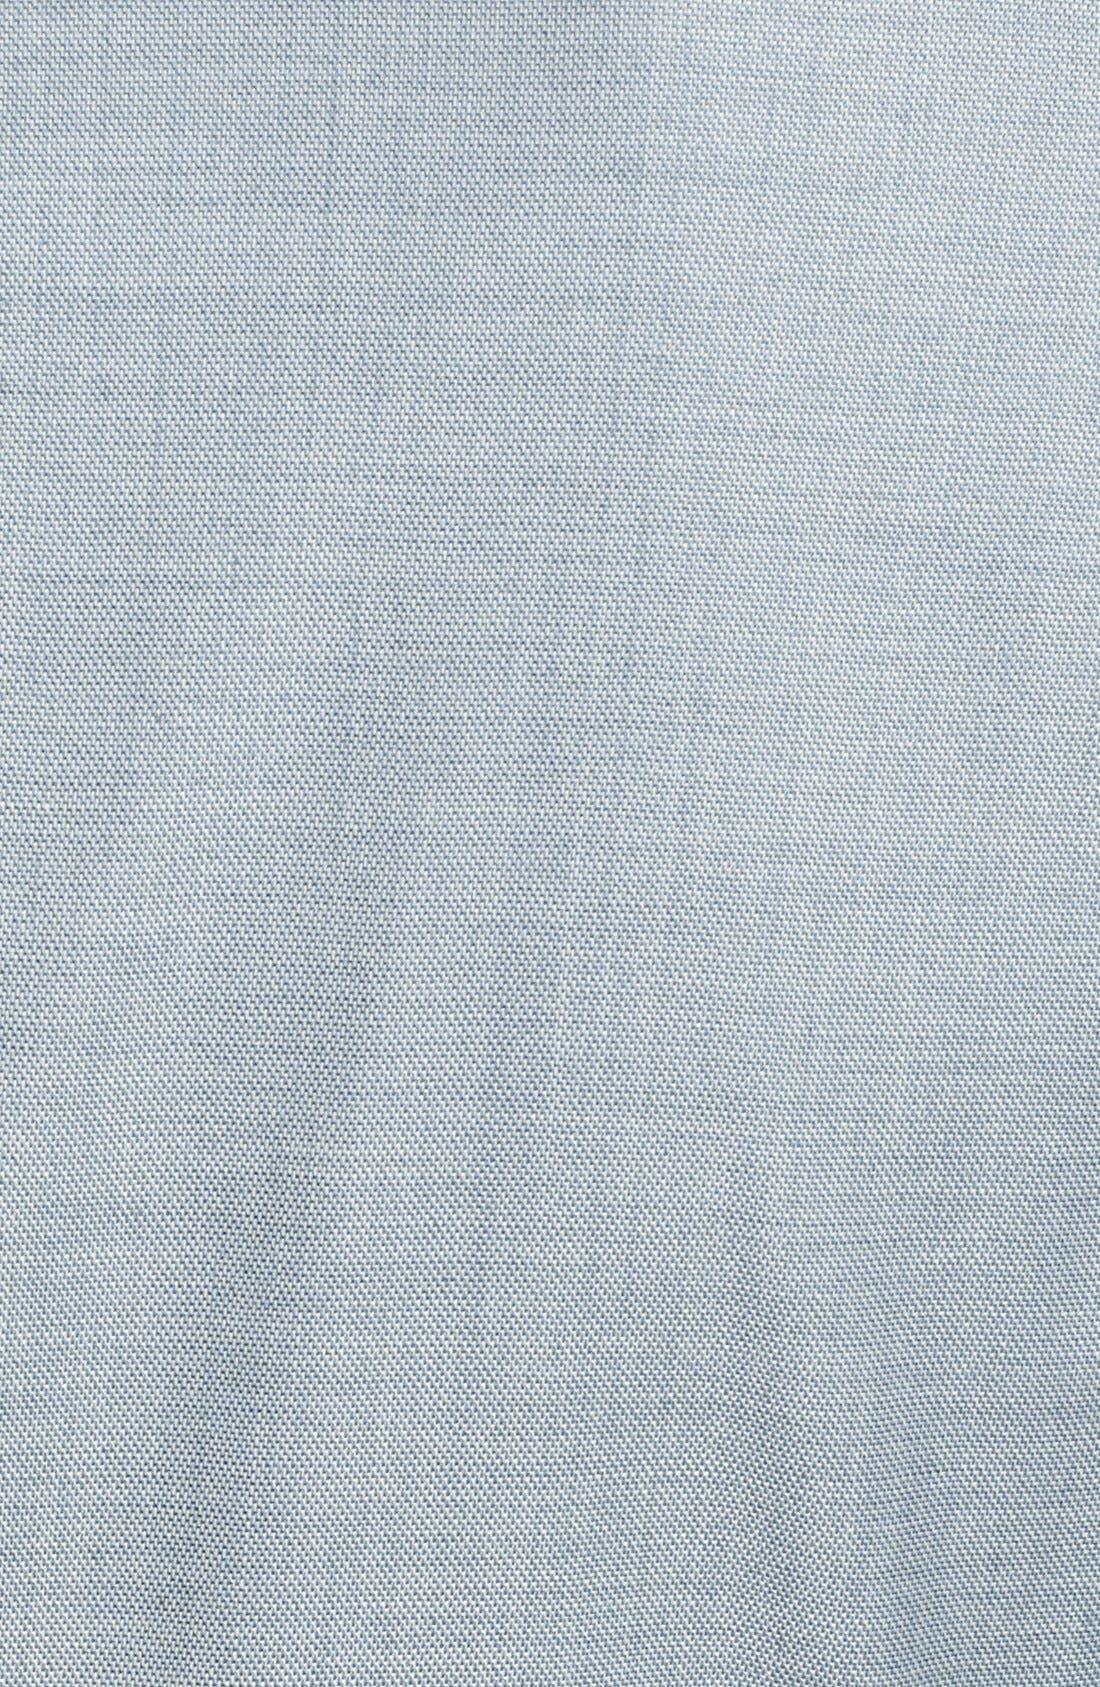 Alternate Image 3  - BOSS HUGO BOSS 'Juicy 6' Stretch Wool Jacket